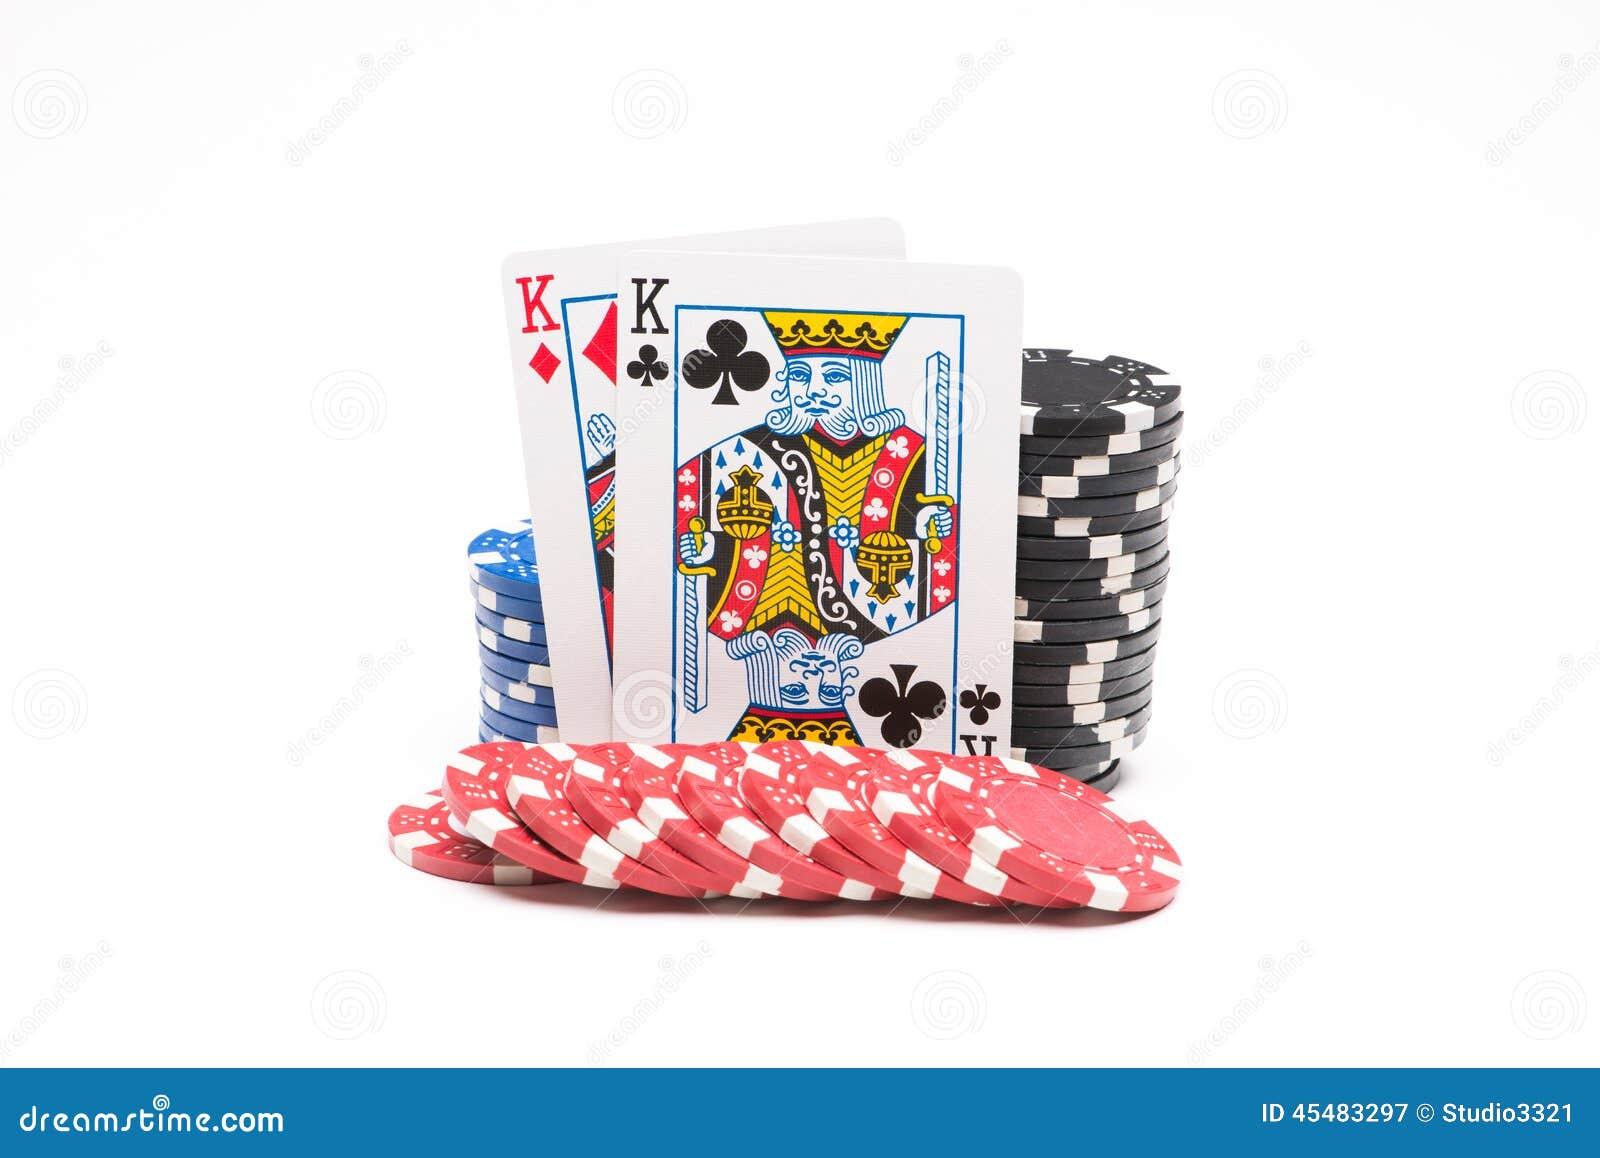 chips and cards royaltyfree stock photo cartoondealer